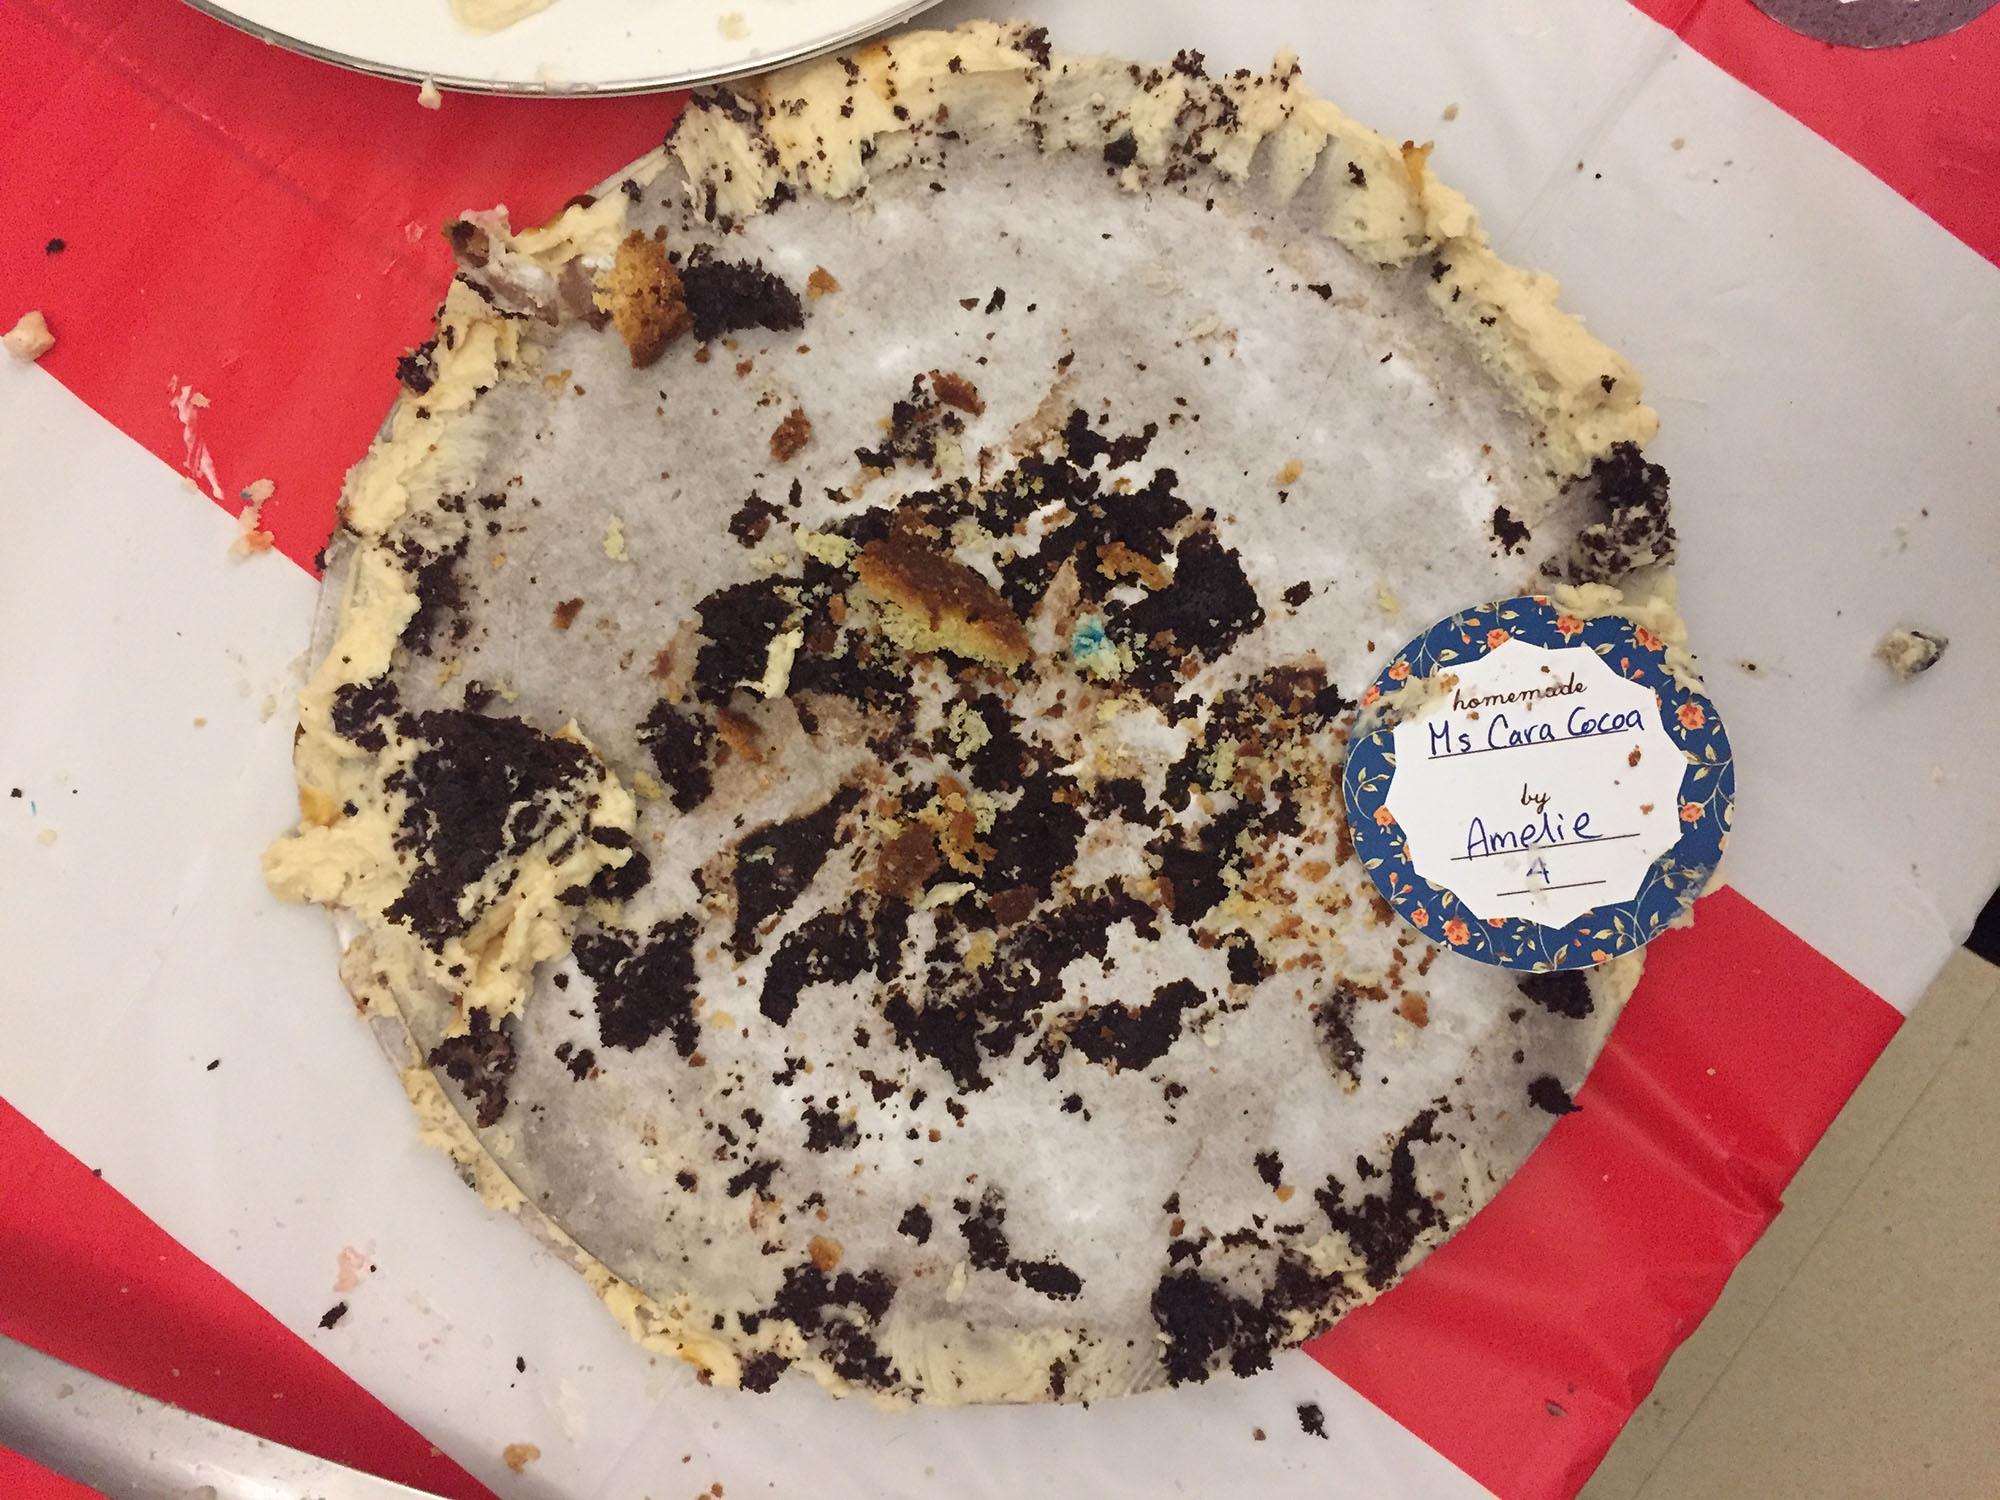 Cake - All gone!